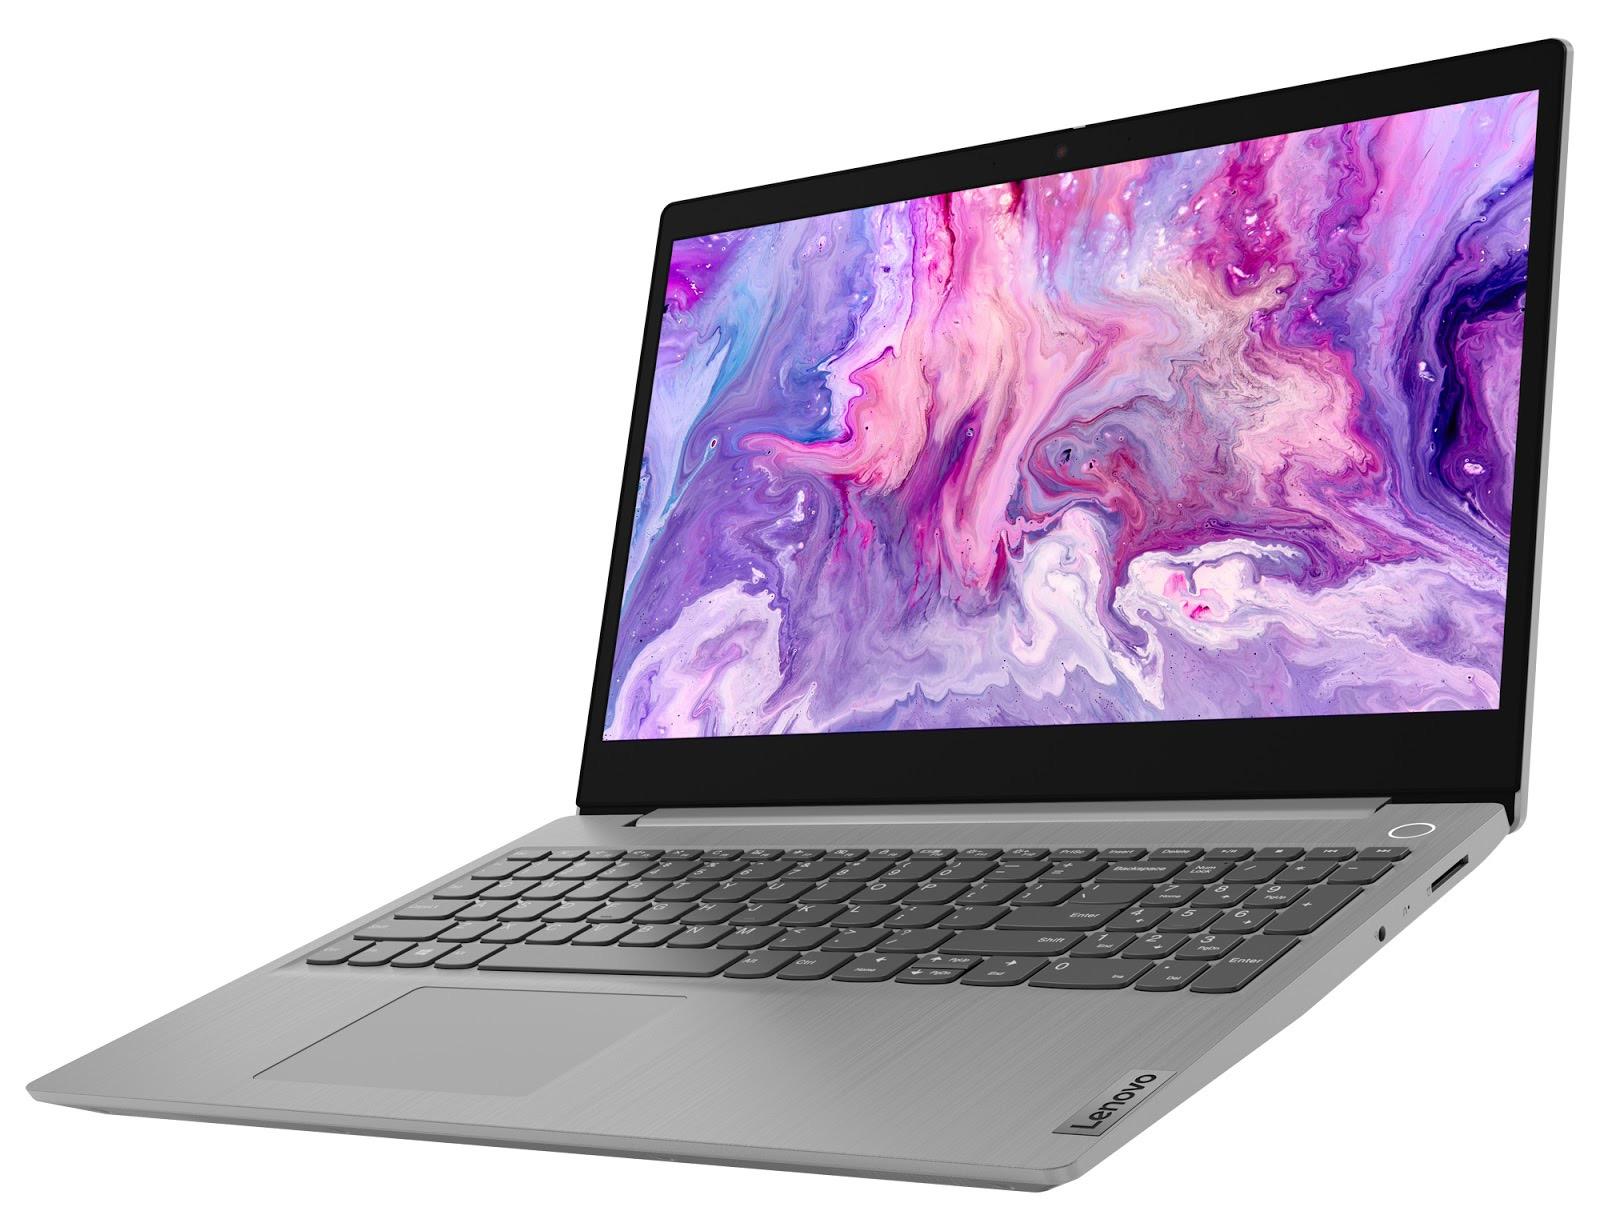 Фото 2. Ноутбук Lenovo ideapad 3 15ADA05 Platinum Grey (81W100TBRE)